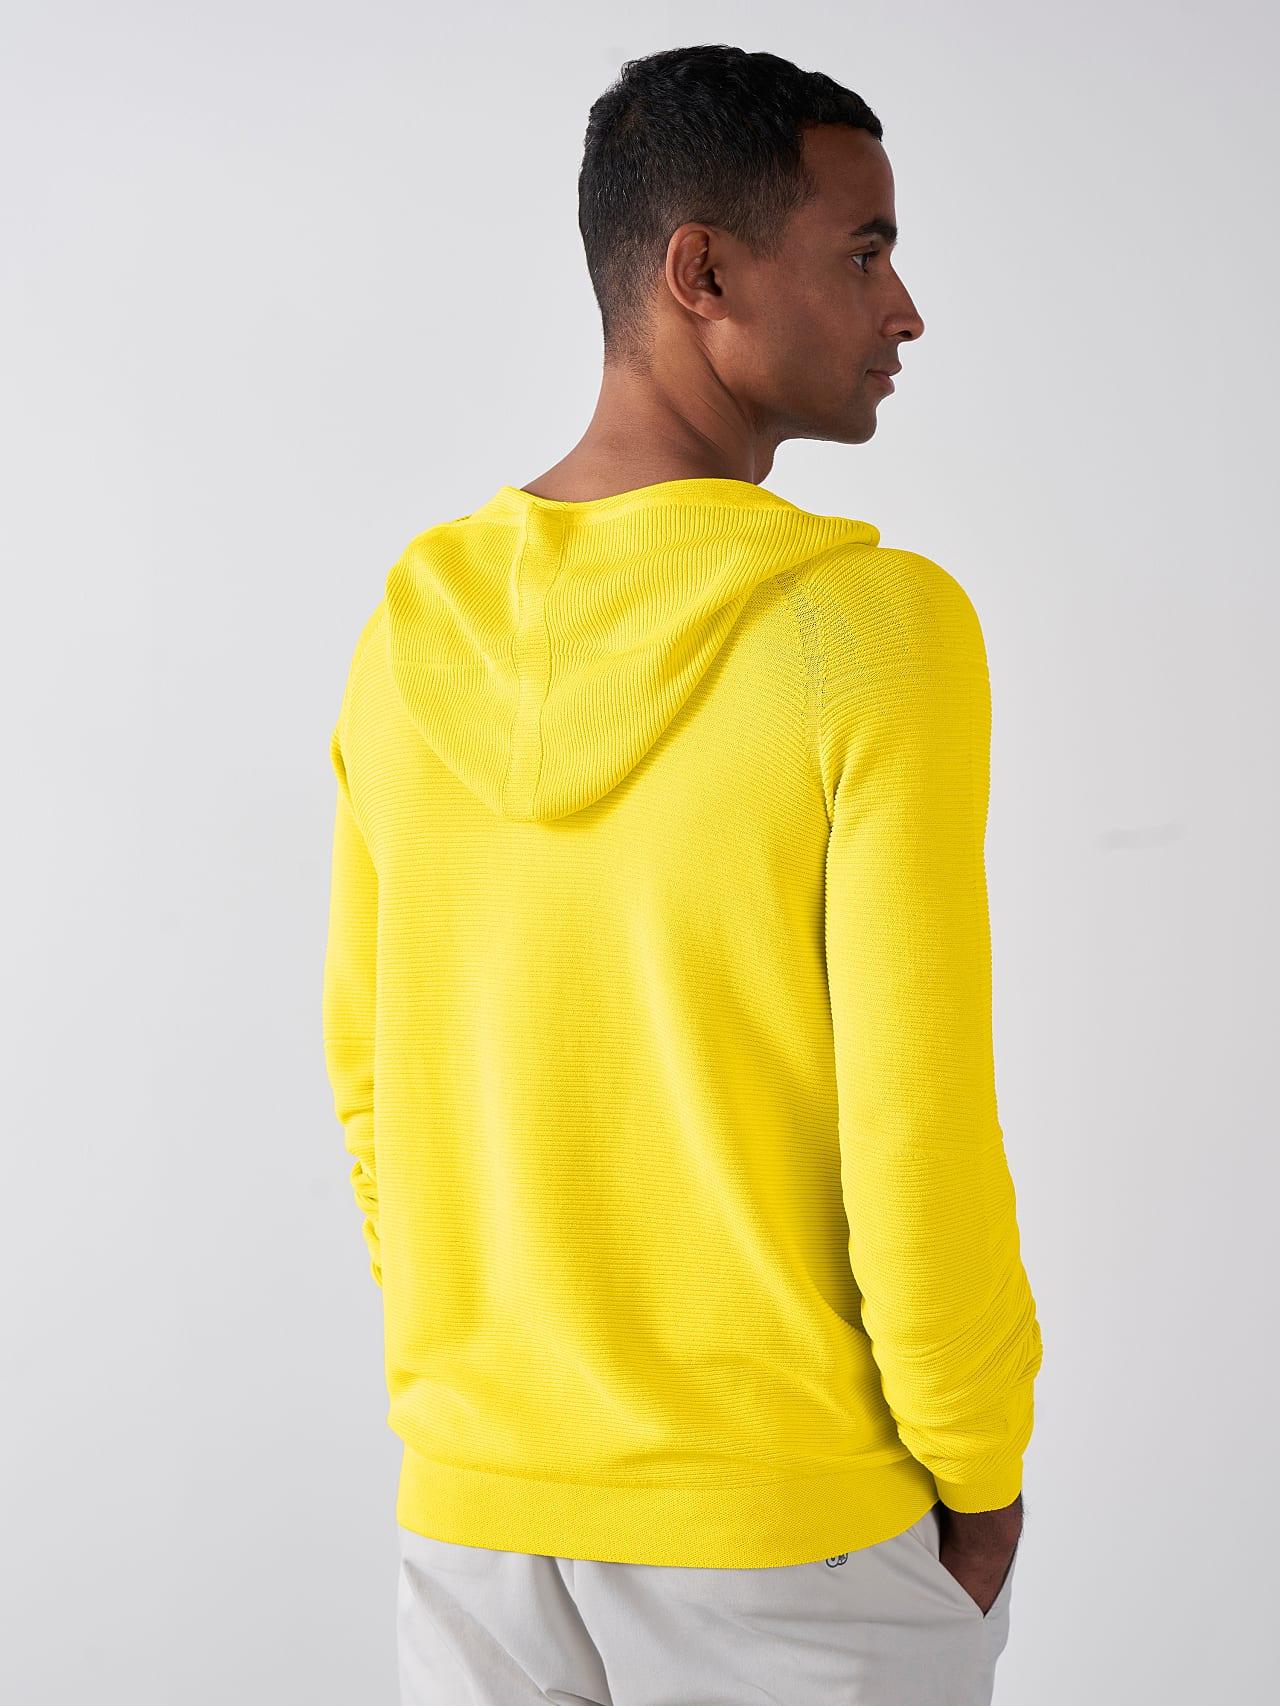 FURAP V3.Y5.01 Seamless Knit Hoodie yellow Model shot Alpha Tauri